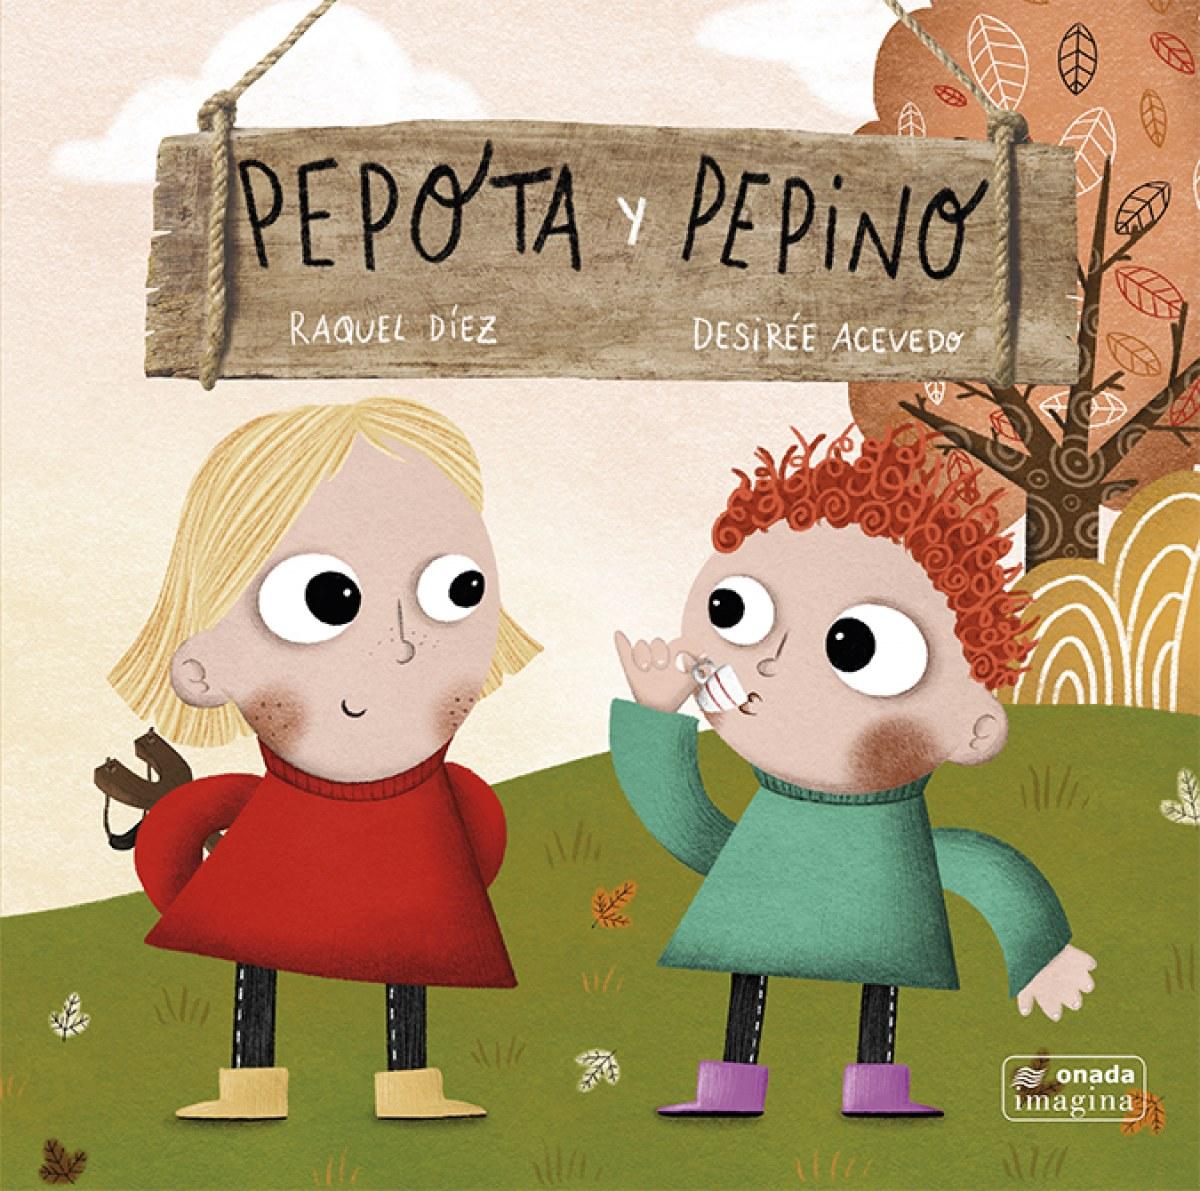 Pepota y Pepino